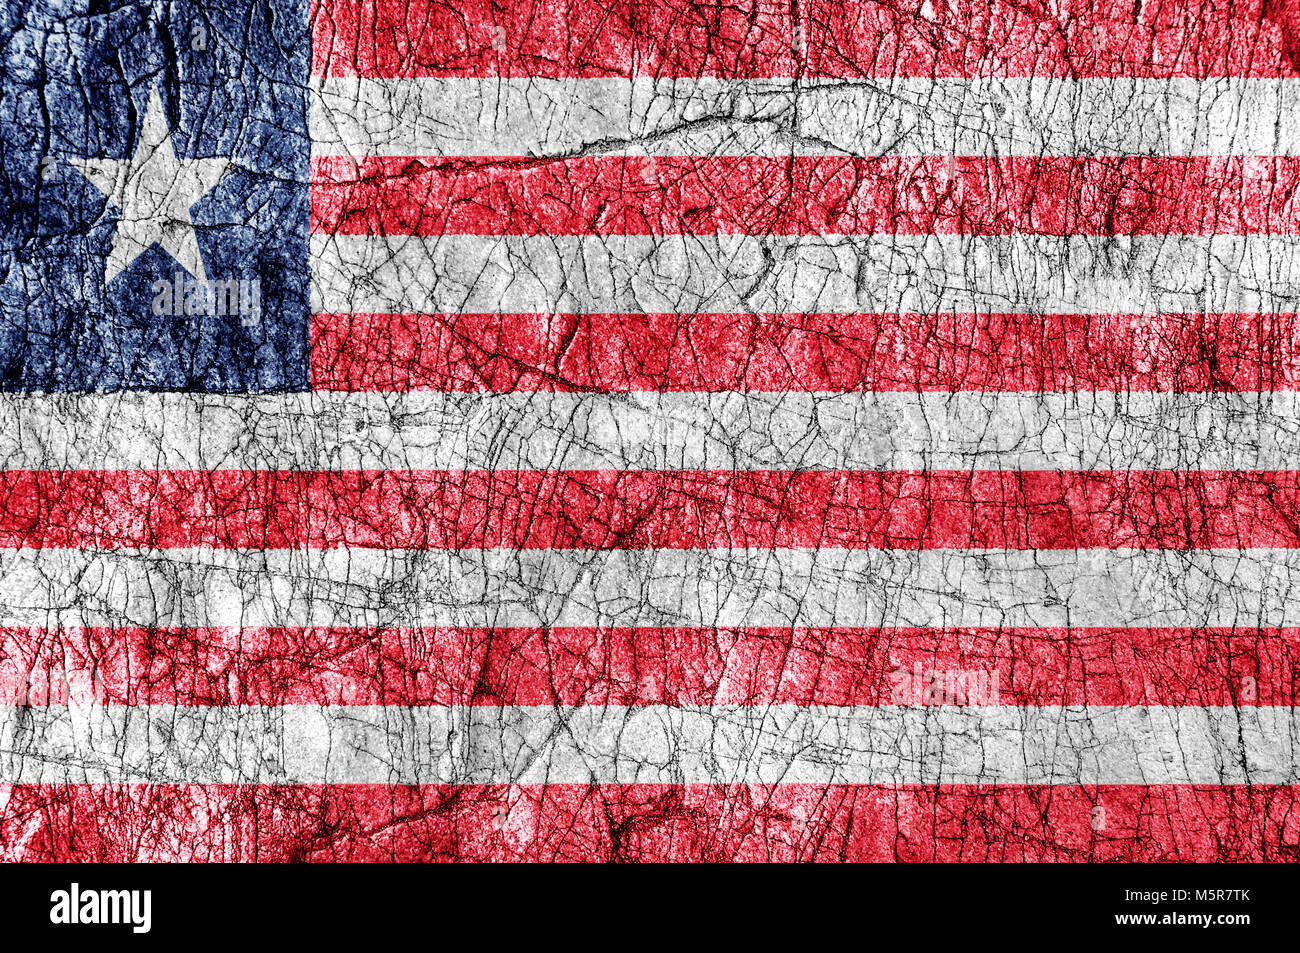 Grudge stone painted Liberia flag - Stock Image